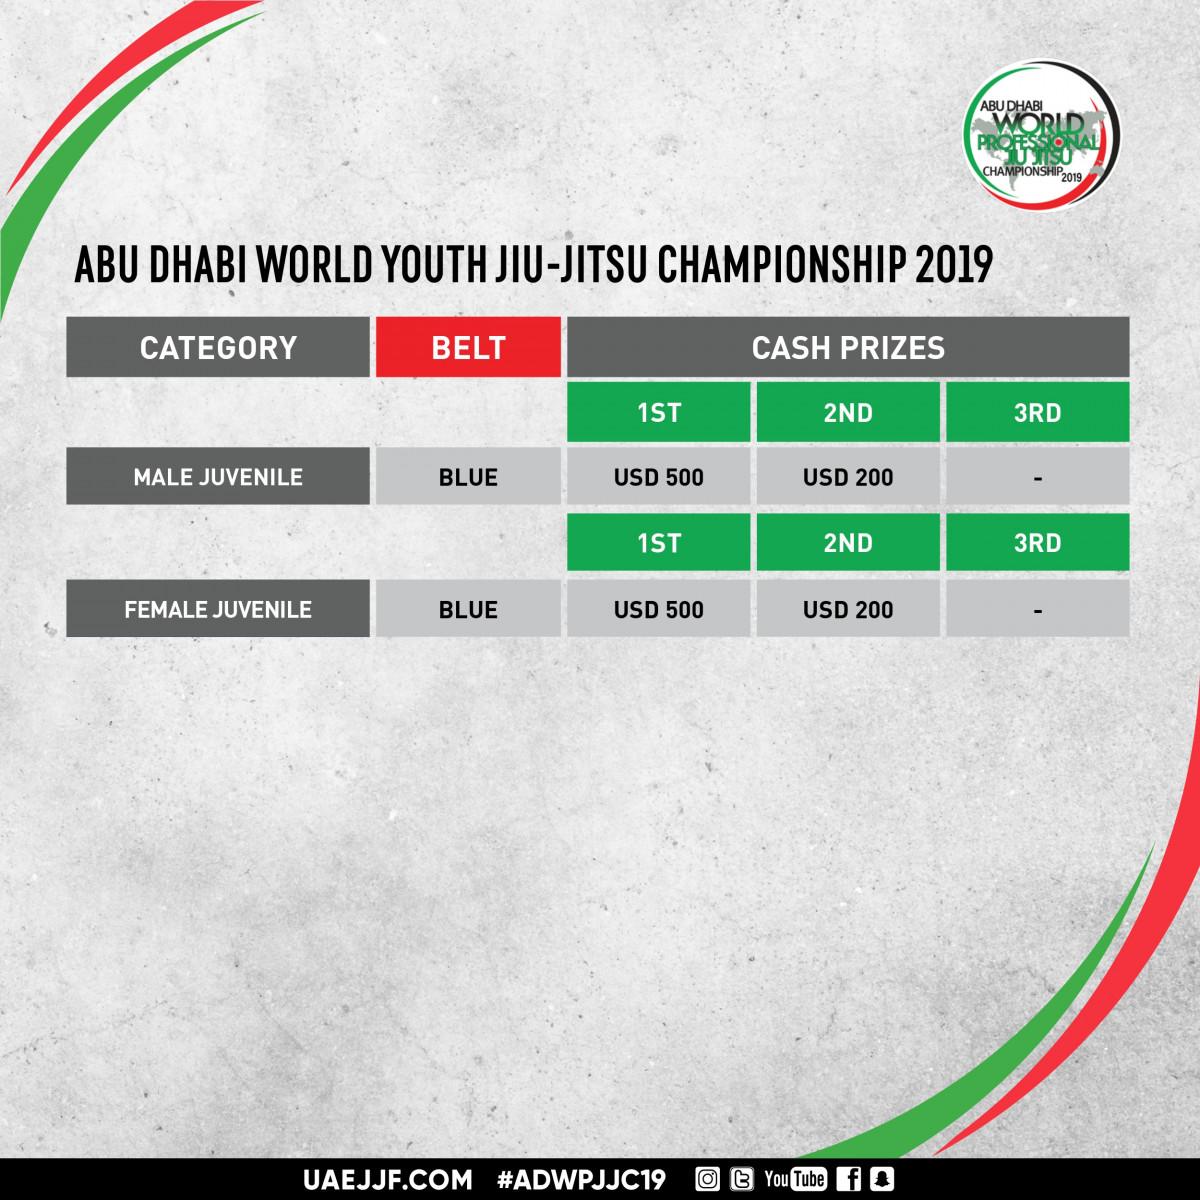 uae-jiu-jitsu-federation-cash-prize-2019-abu-dhabi-world-youth-jiu-jitsu-championship-20190320064533.jpeg